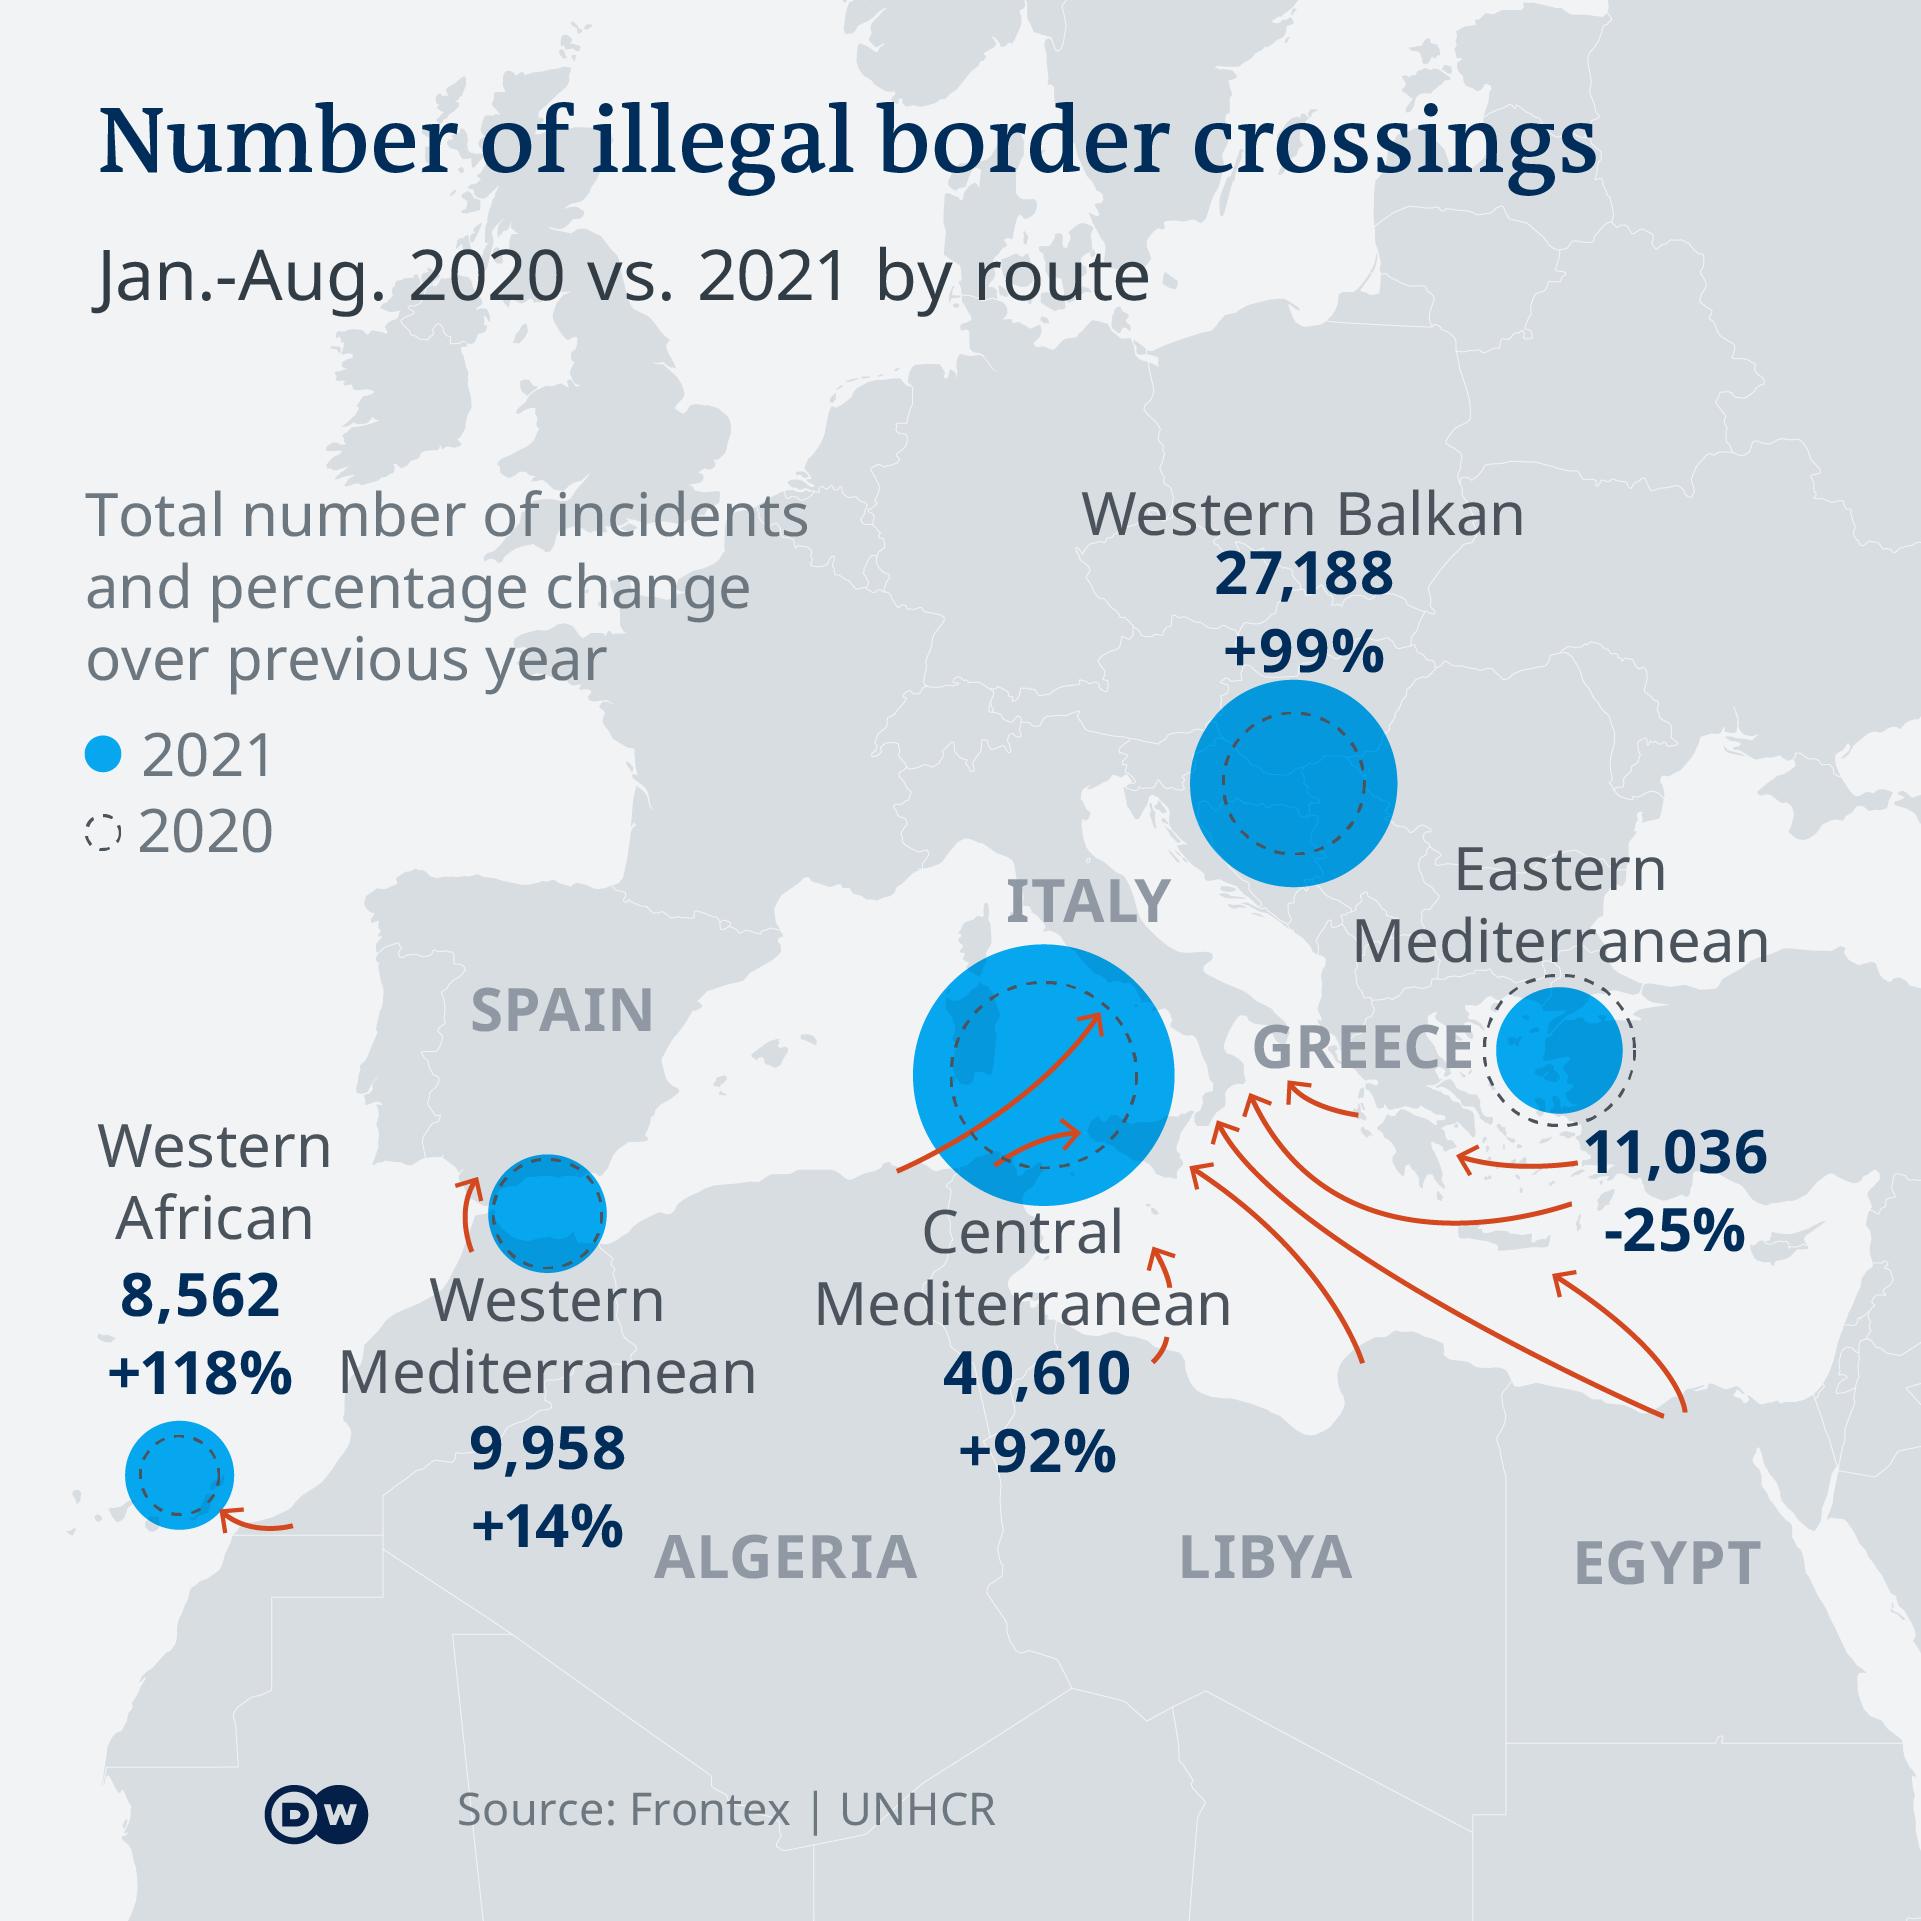 Illegal border crossings to Europe 2020 vs. 2021